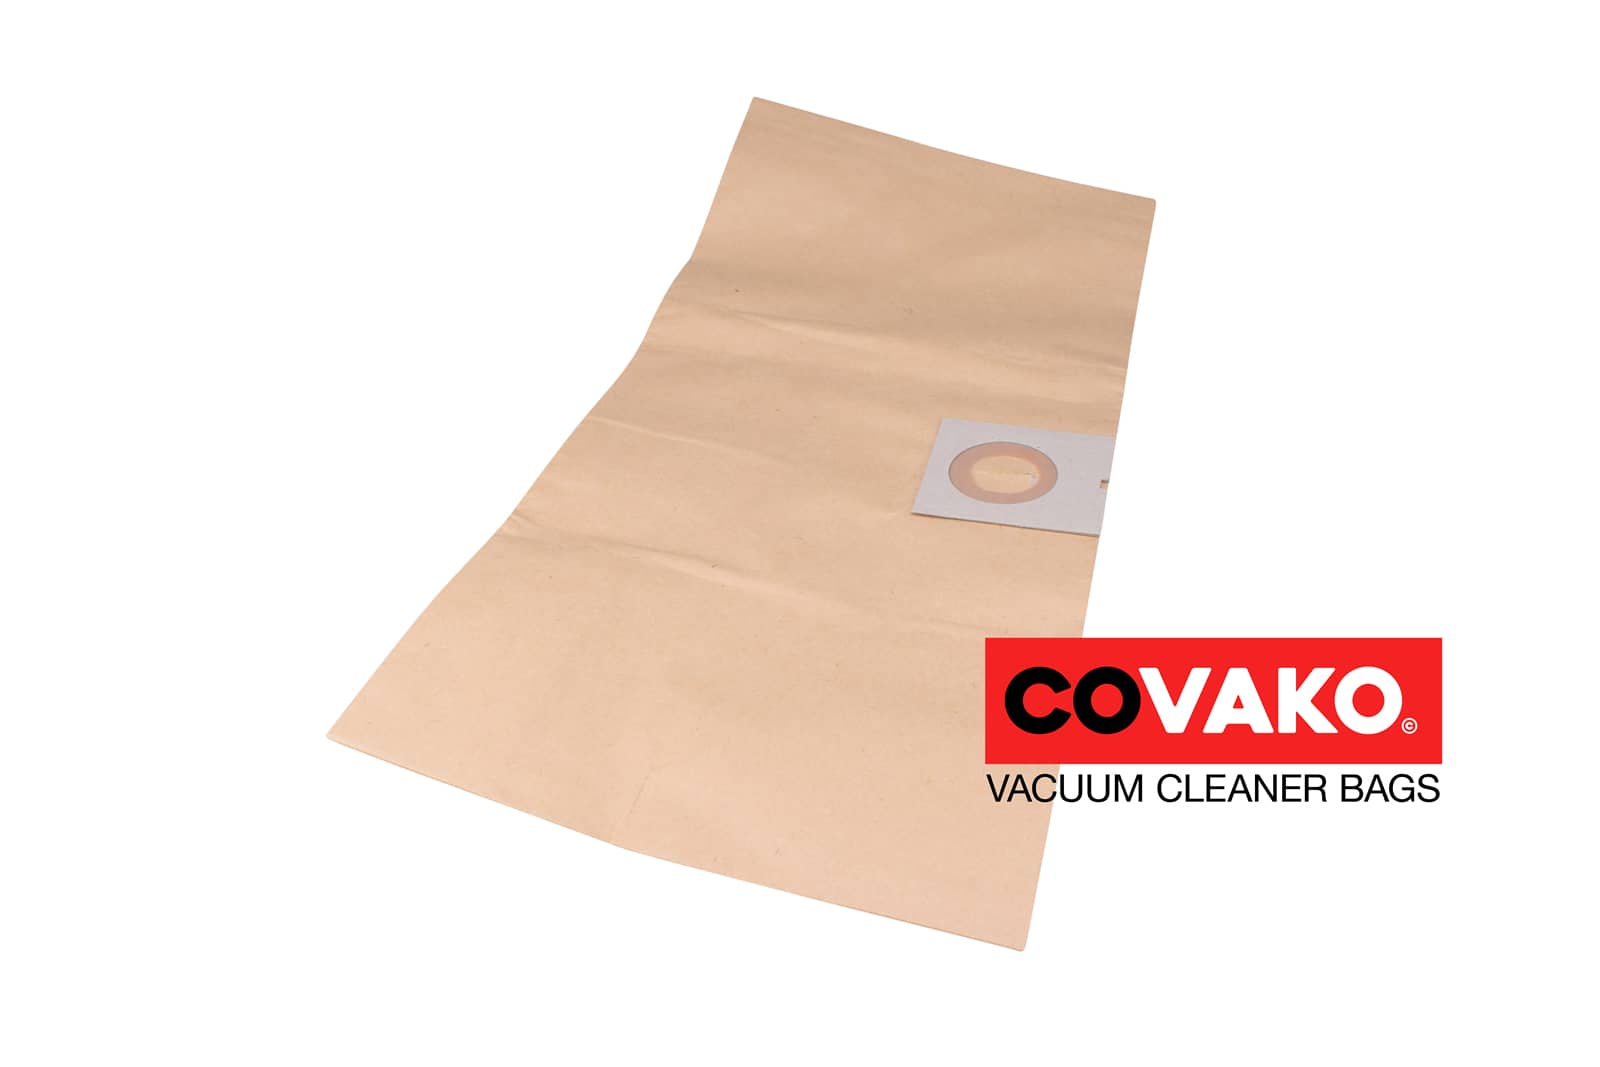 Kärcher NT 27/1 / Papier - Kärcher sacs d'aspirateur